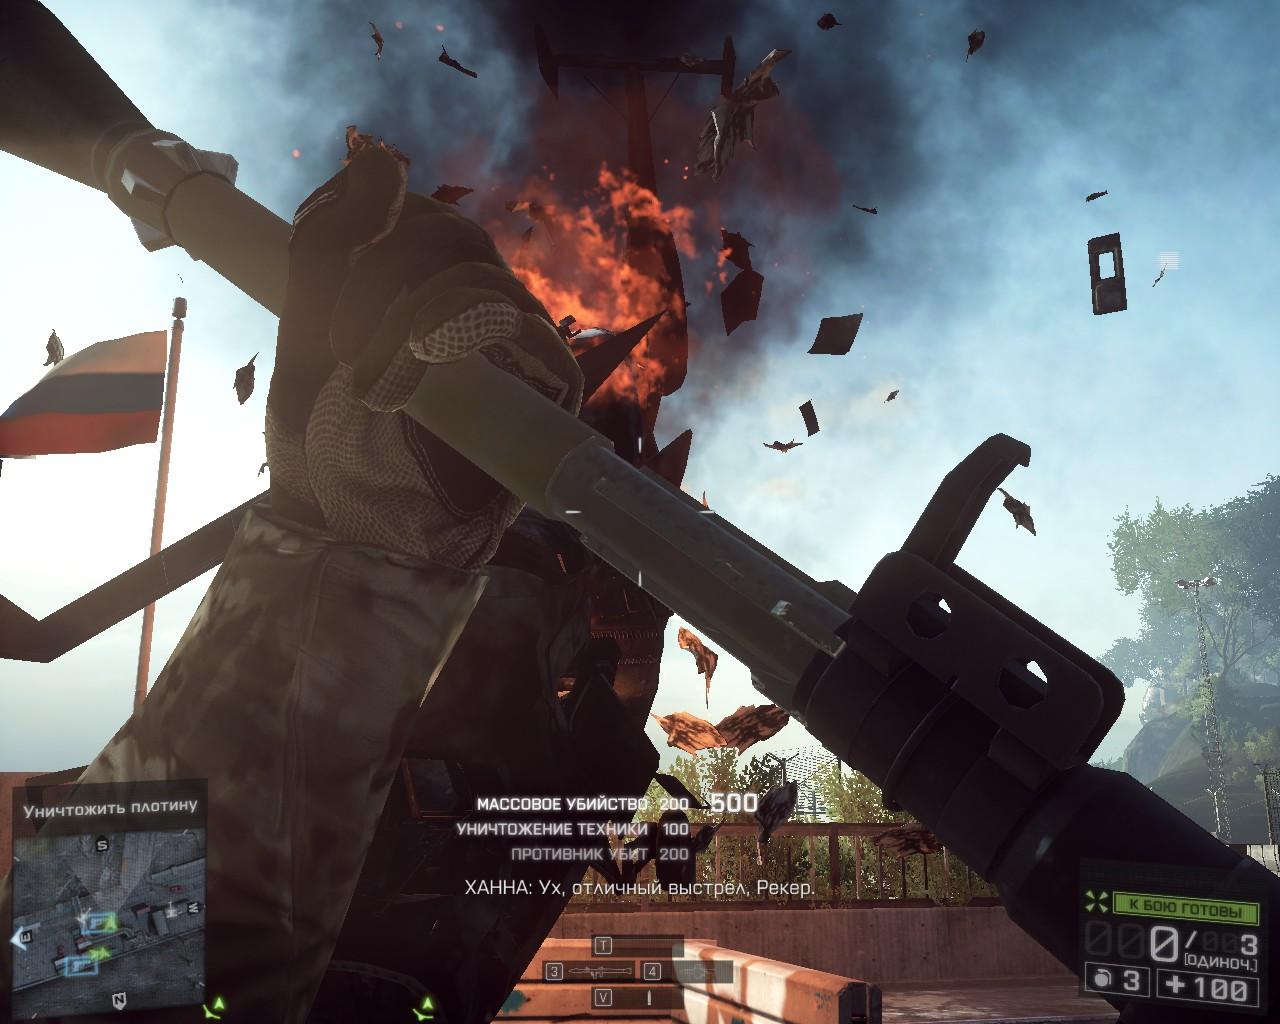 bf4 2014-04-07 00-10-43-67.jpg - Battlefield 4